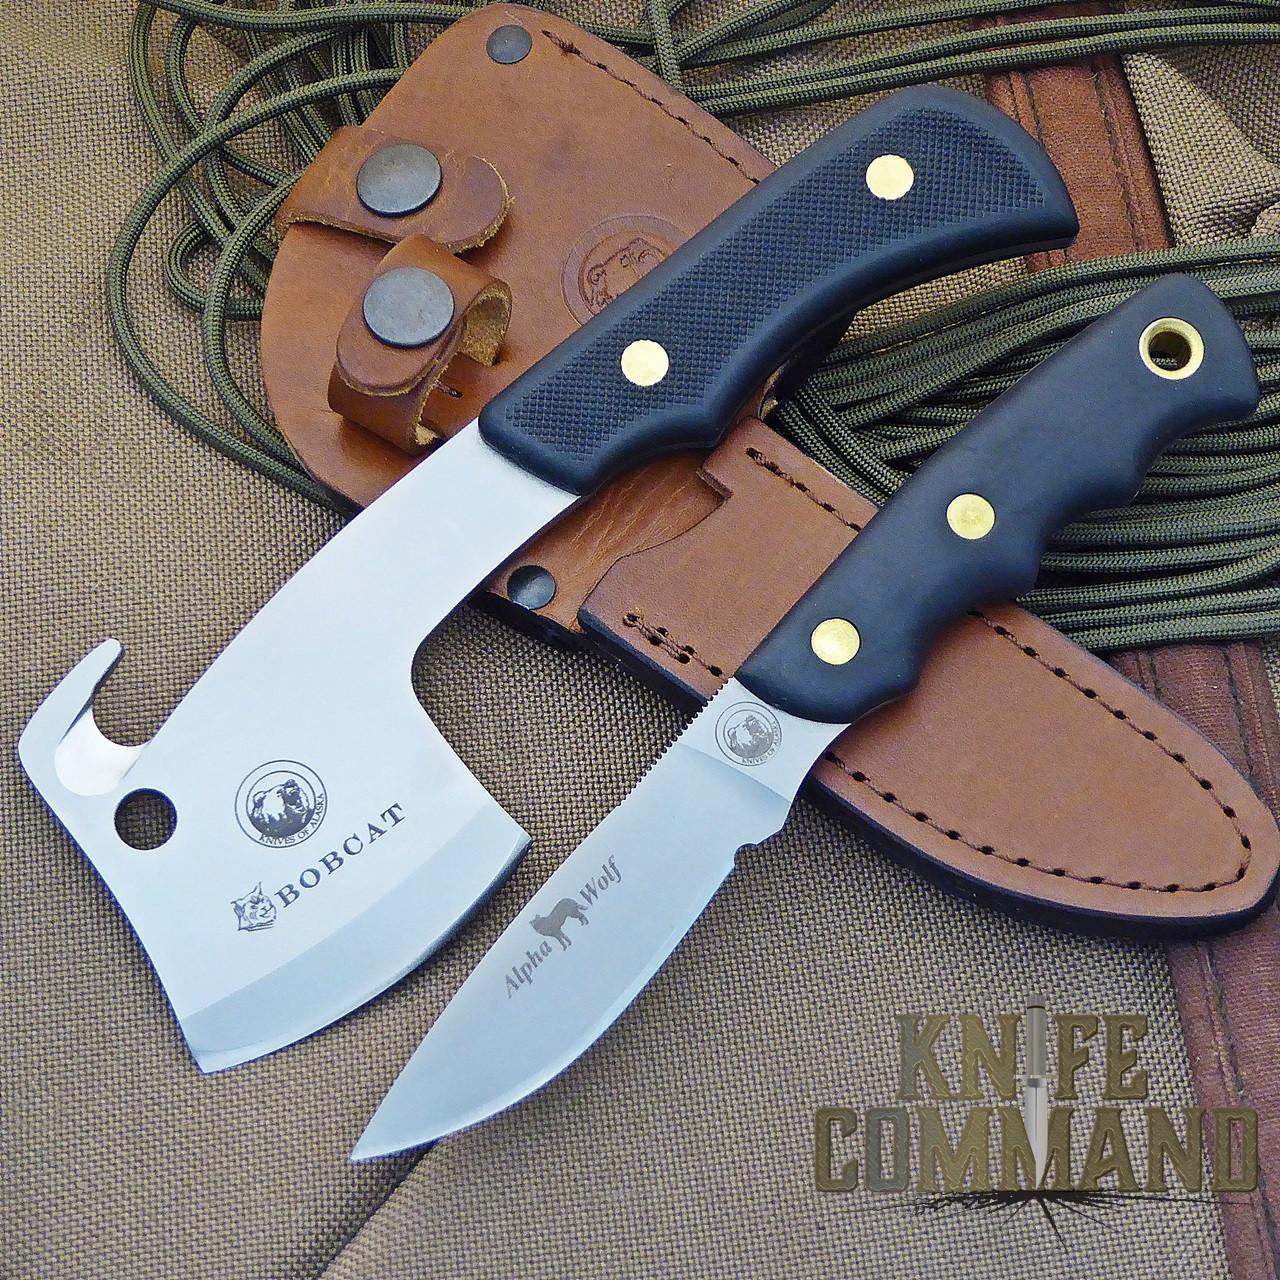 Knives of Alaska Bobcat Mini Hatchet Alpha Wolf Hunting Knife Combo.  Bobcat Mini Hatchet plus Alpha Wolf knife.